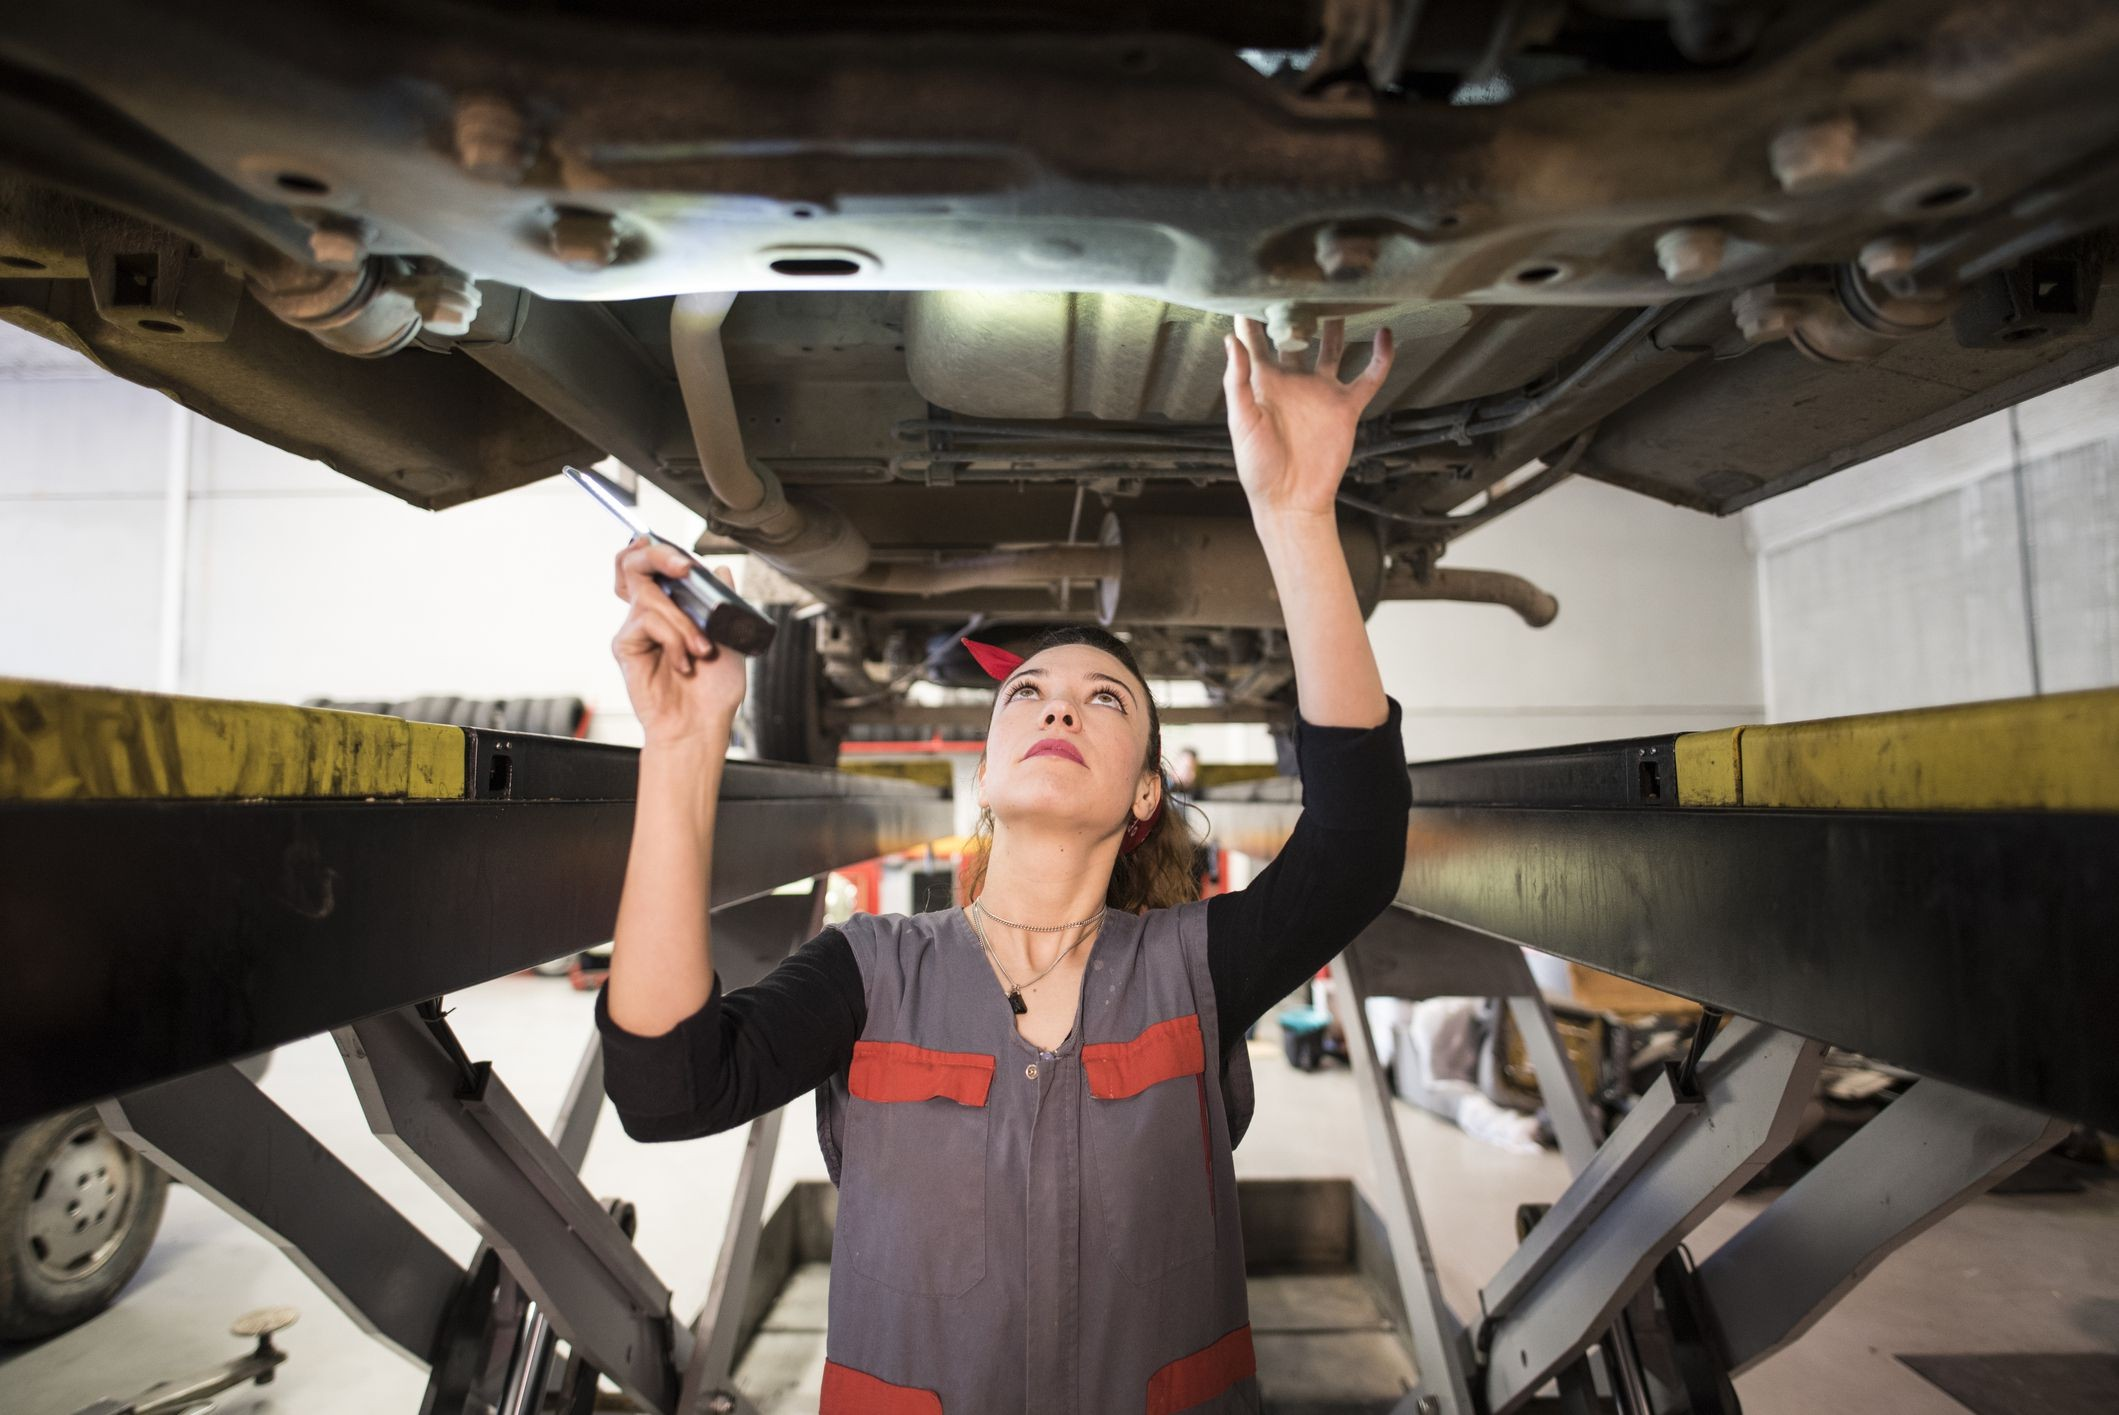 Car Body Parts Diagram Catalog What are aftermarket Parts Car Insurance & Repairs Of Car Body Parts Diagram Catalog